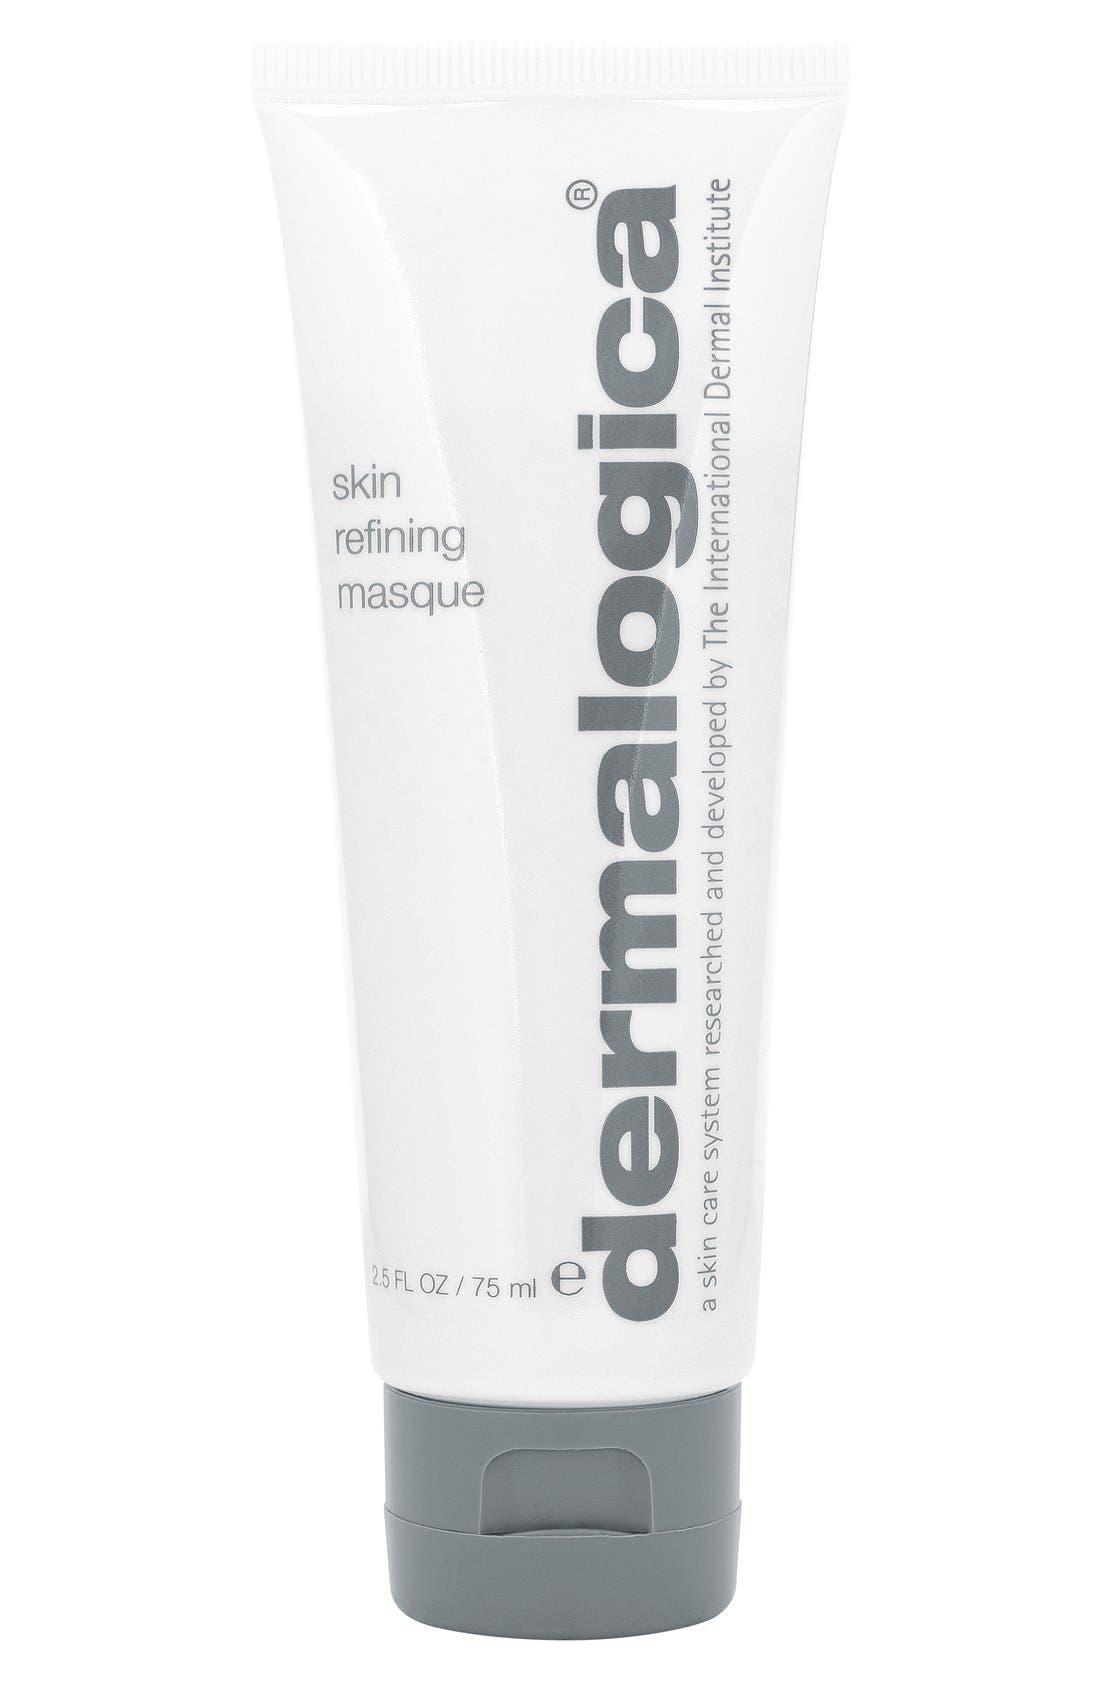 dermalogica® Skin Refining Masque